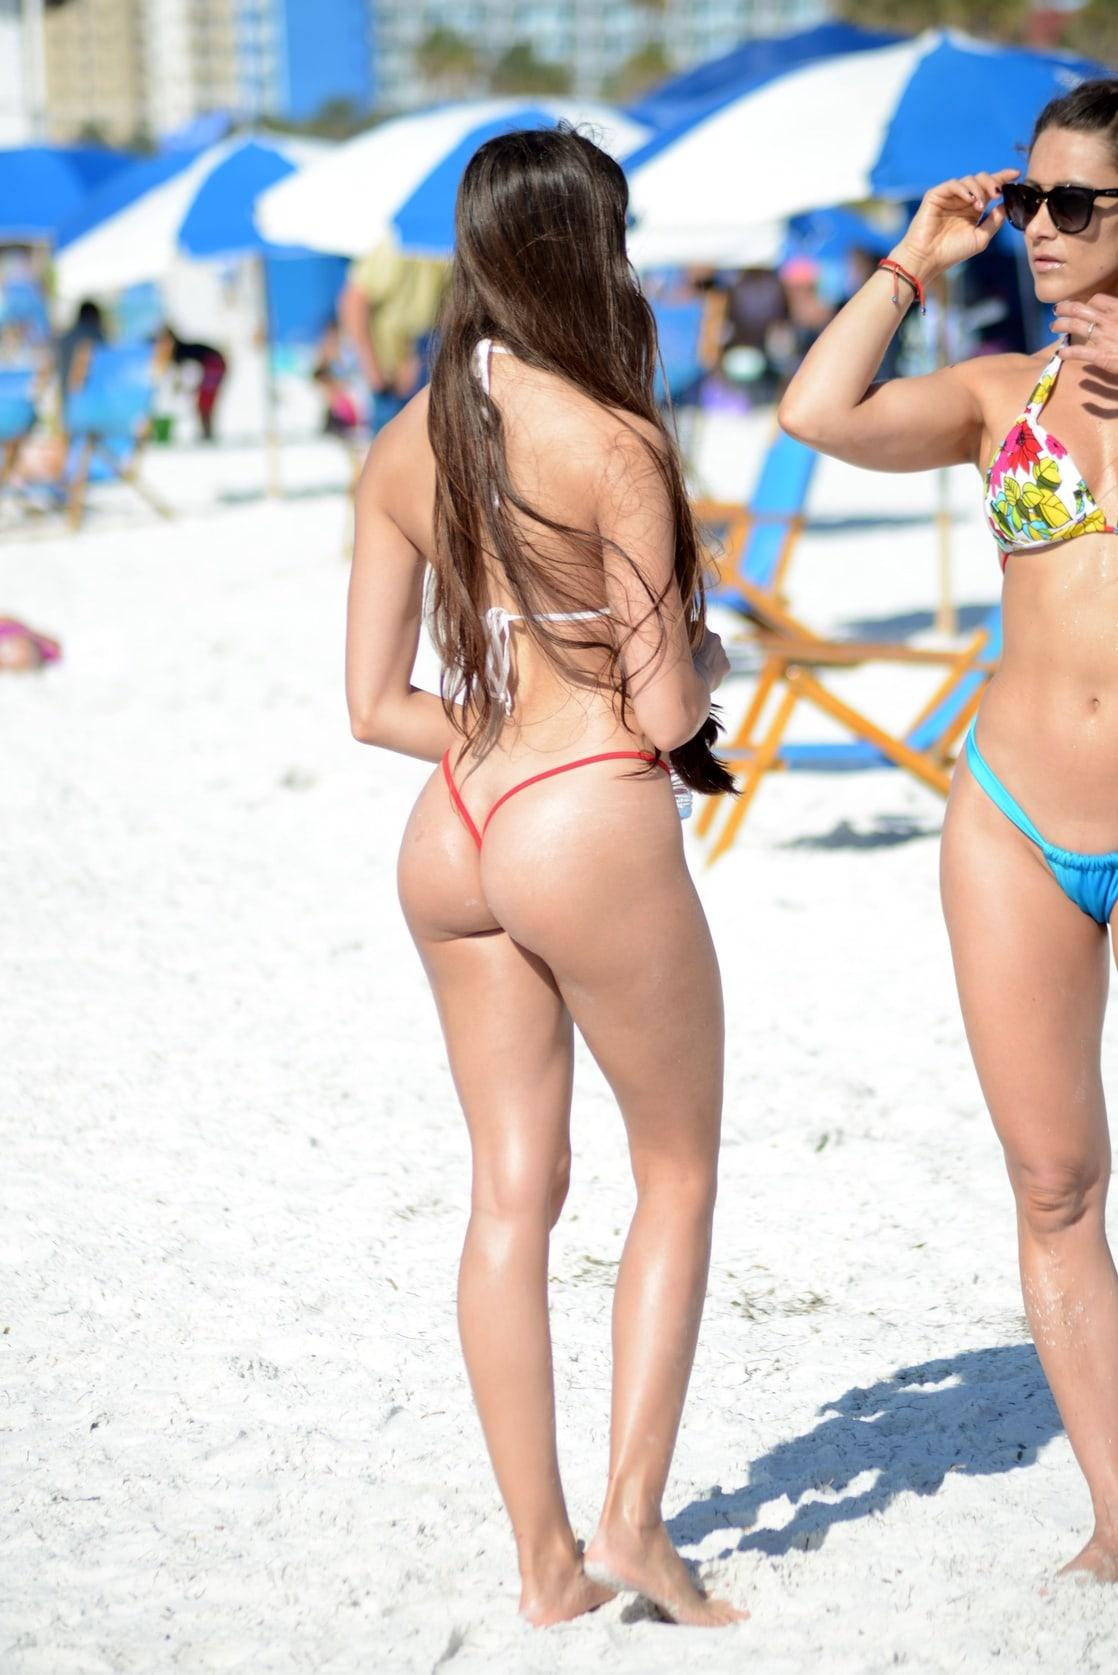 naked (74 photos), Bikini Celebrity pic